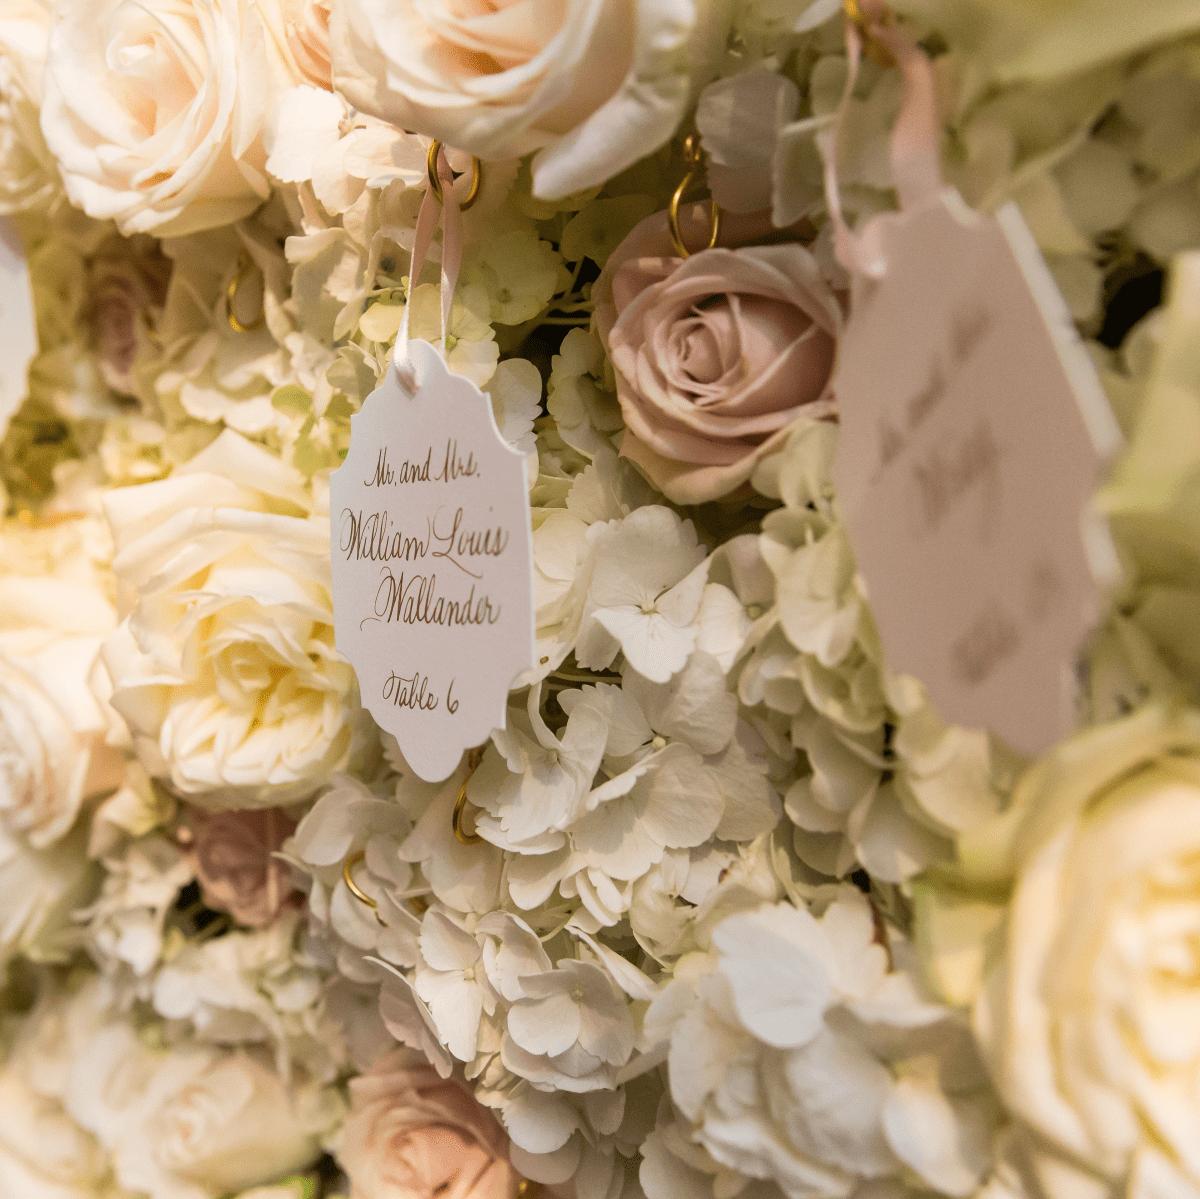 Dee Wallander, Close up Flowers